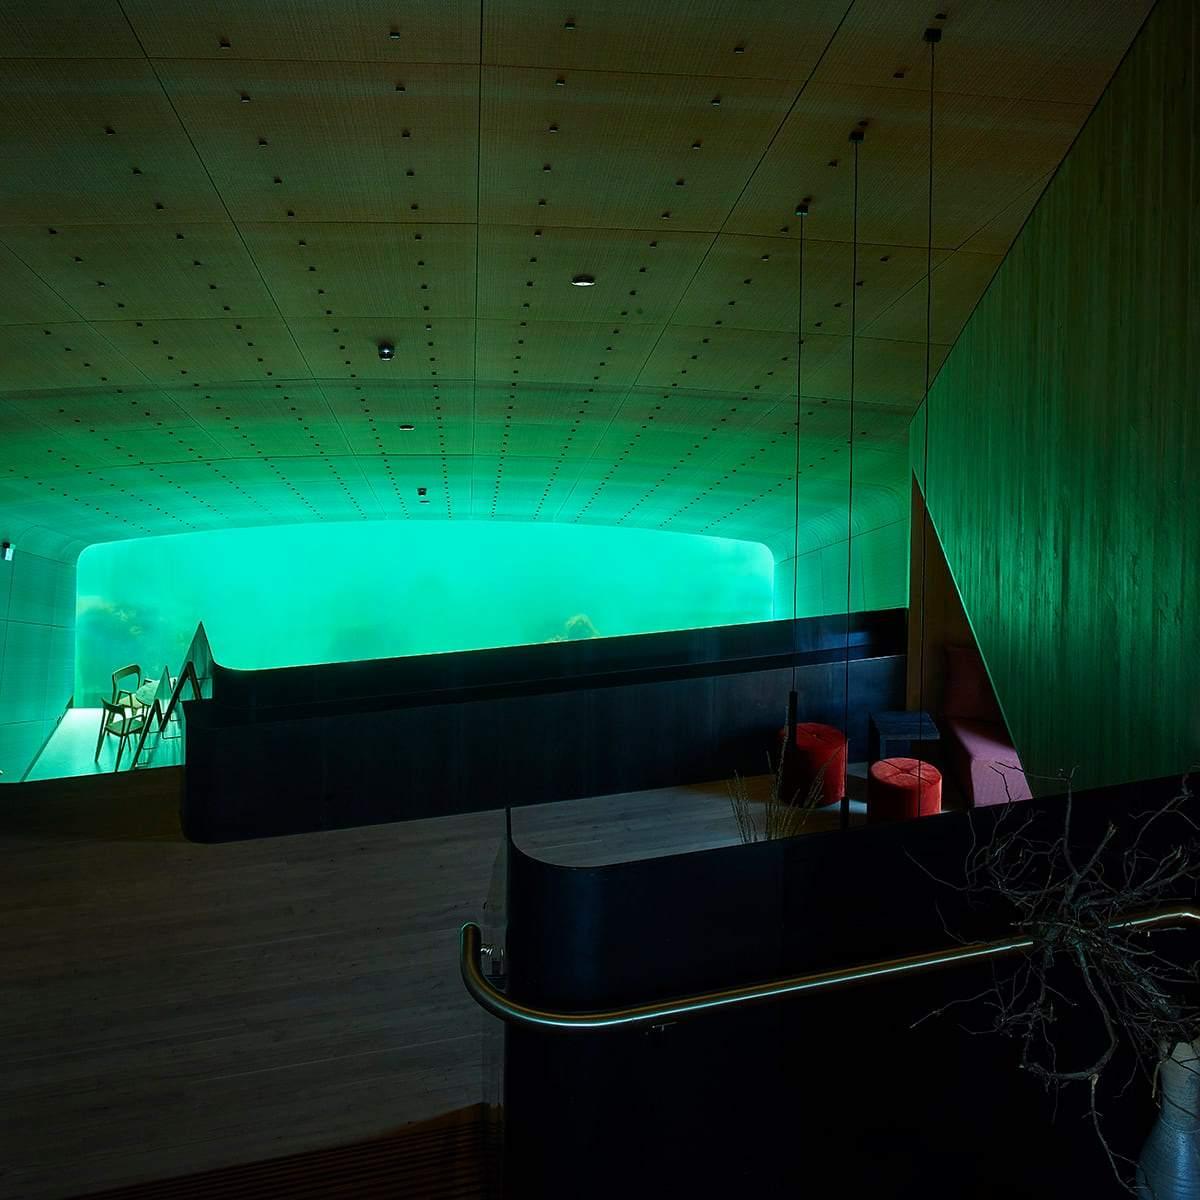 Under, Νορβηγία  το πιο Instagrammable εστιατόριο στον κόσμο, είσοδος